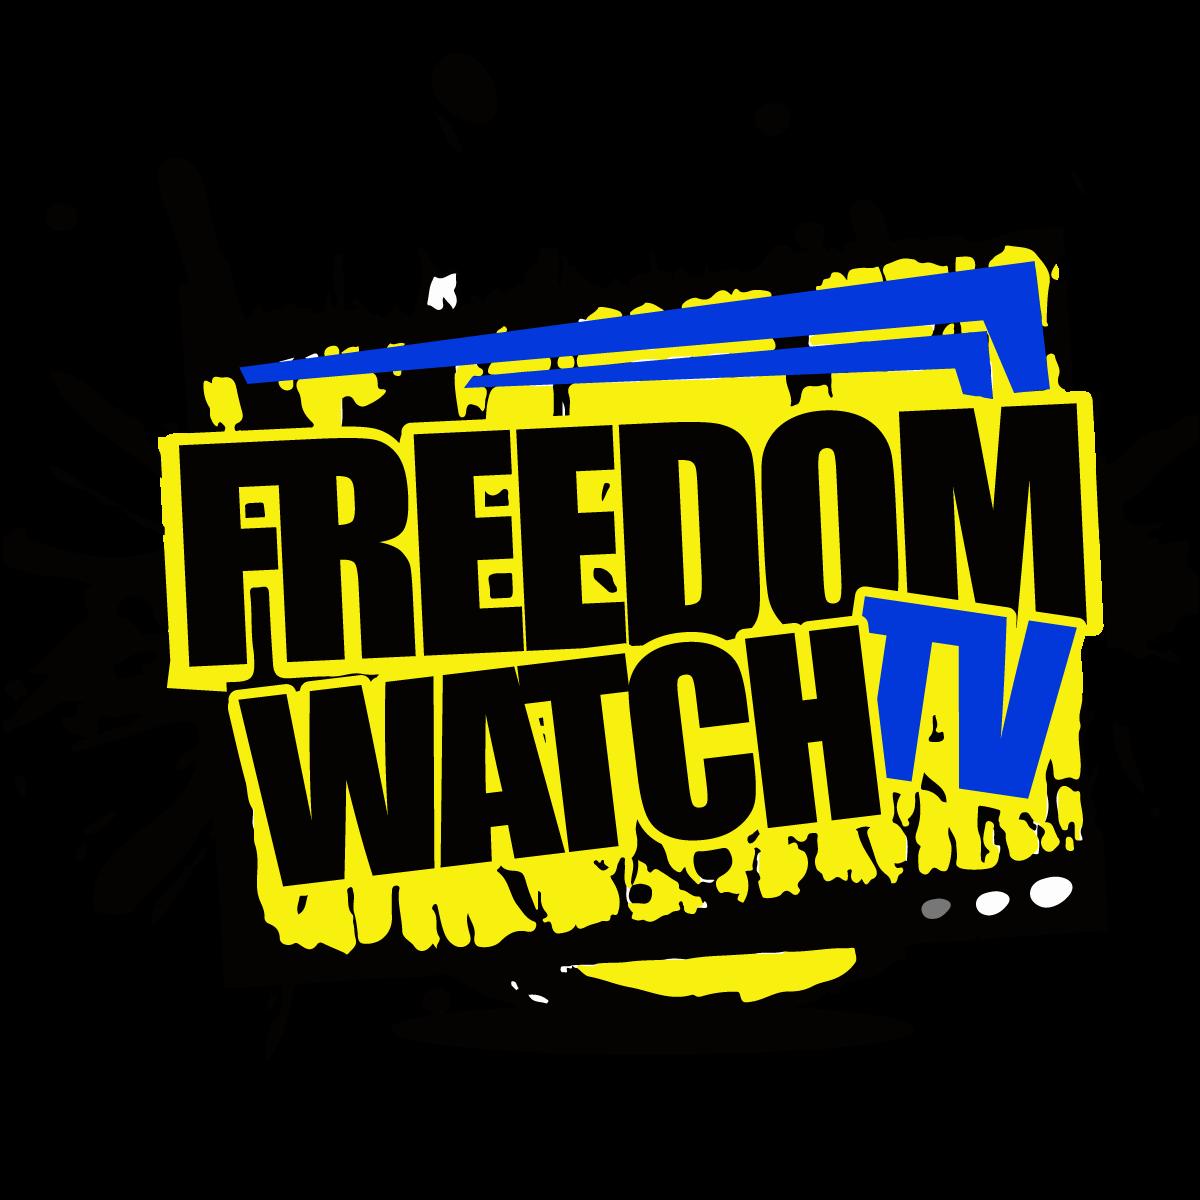 Freedom Watch TV Global